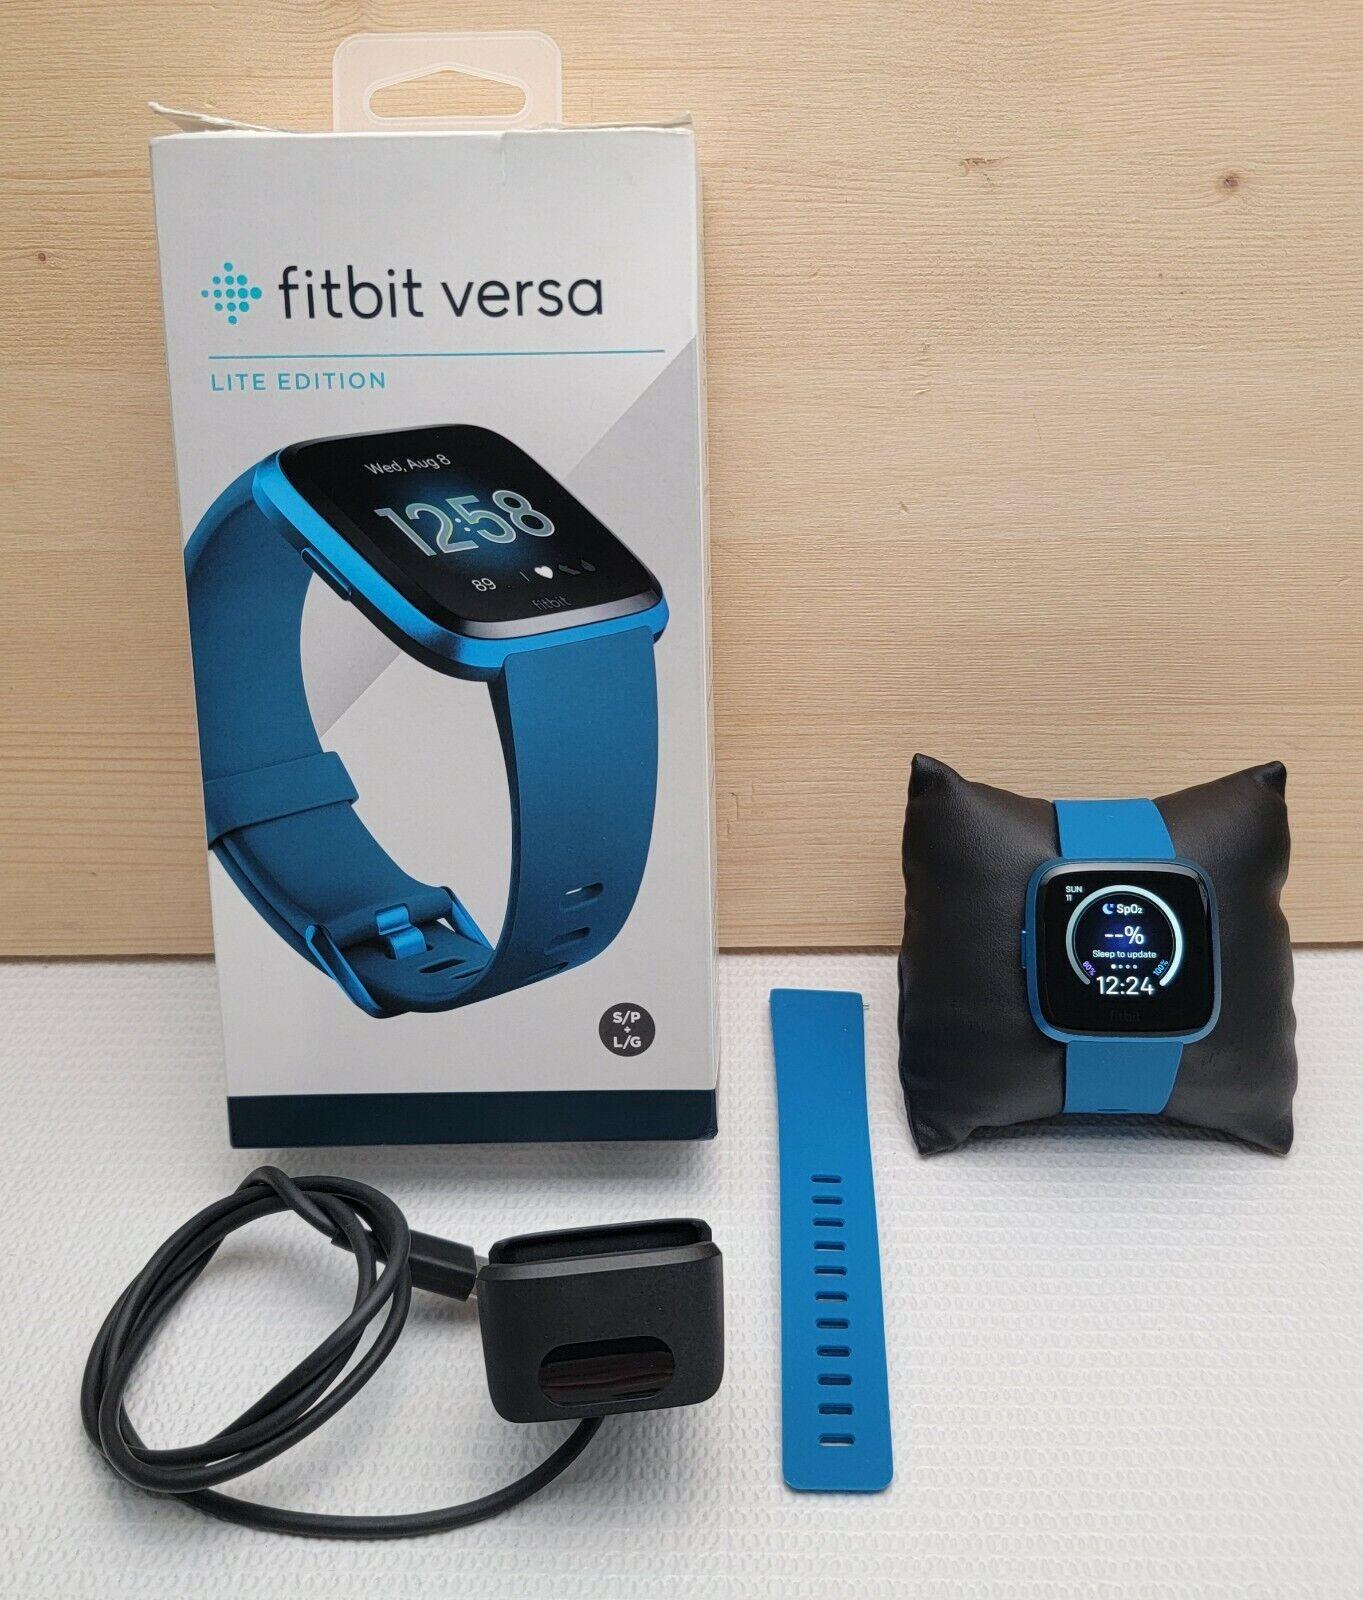 Fitbit Versa Lite Fitness Activity, Sleep, Heart Rate Tracker - Marina Blue blue fitbit fitness heart lite marina rate tracker versa